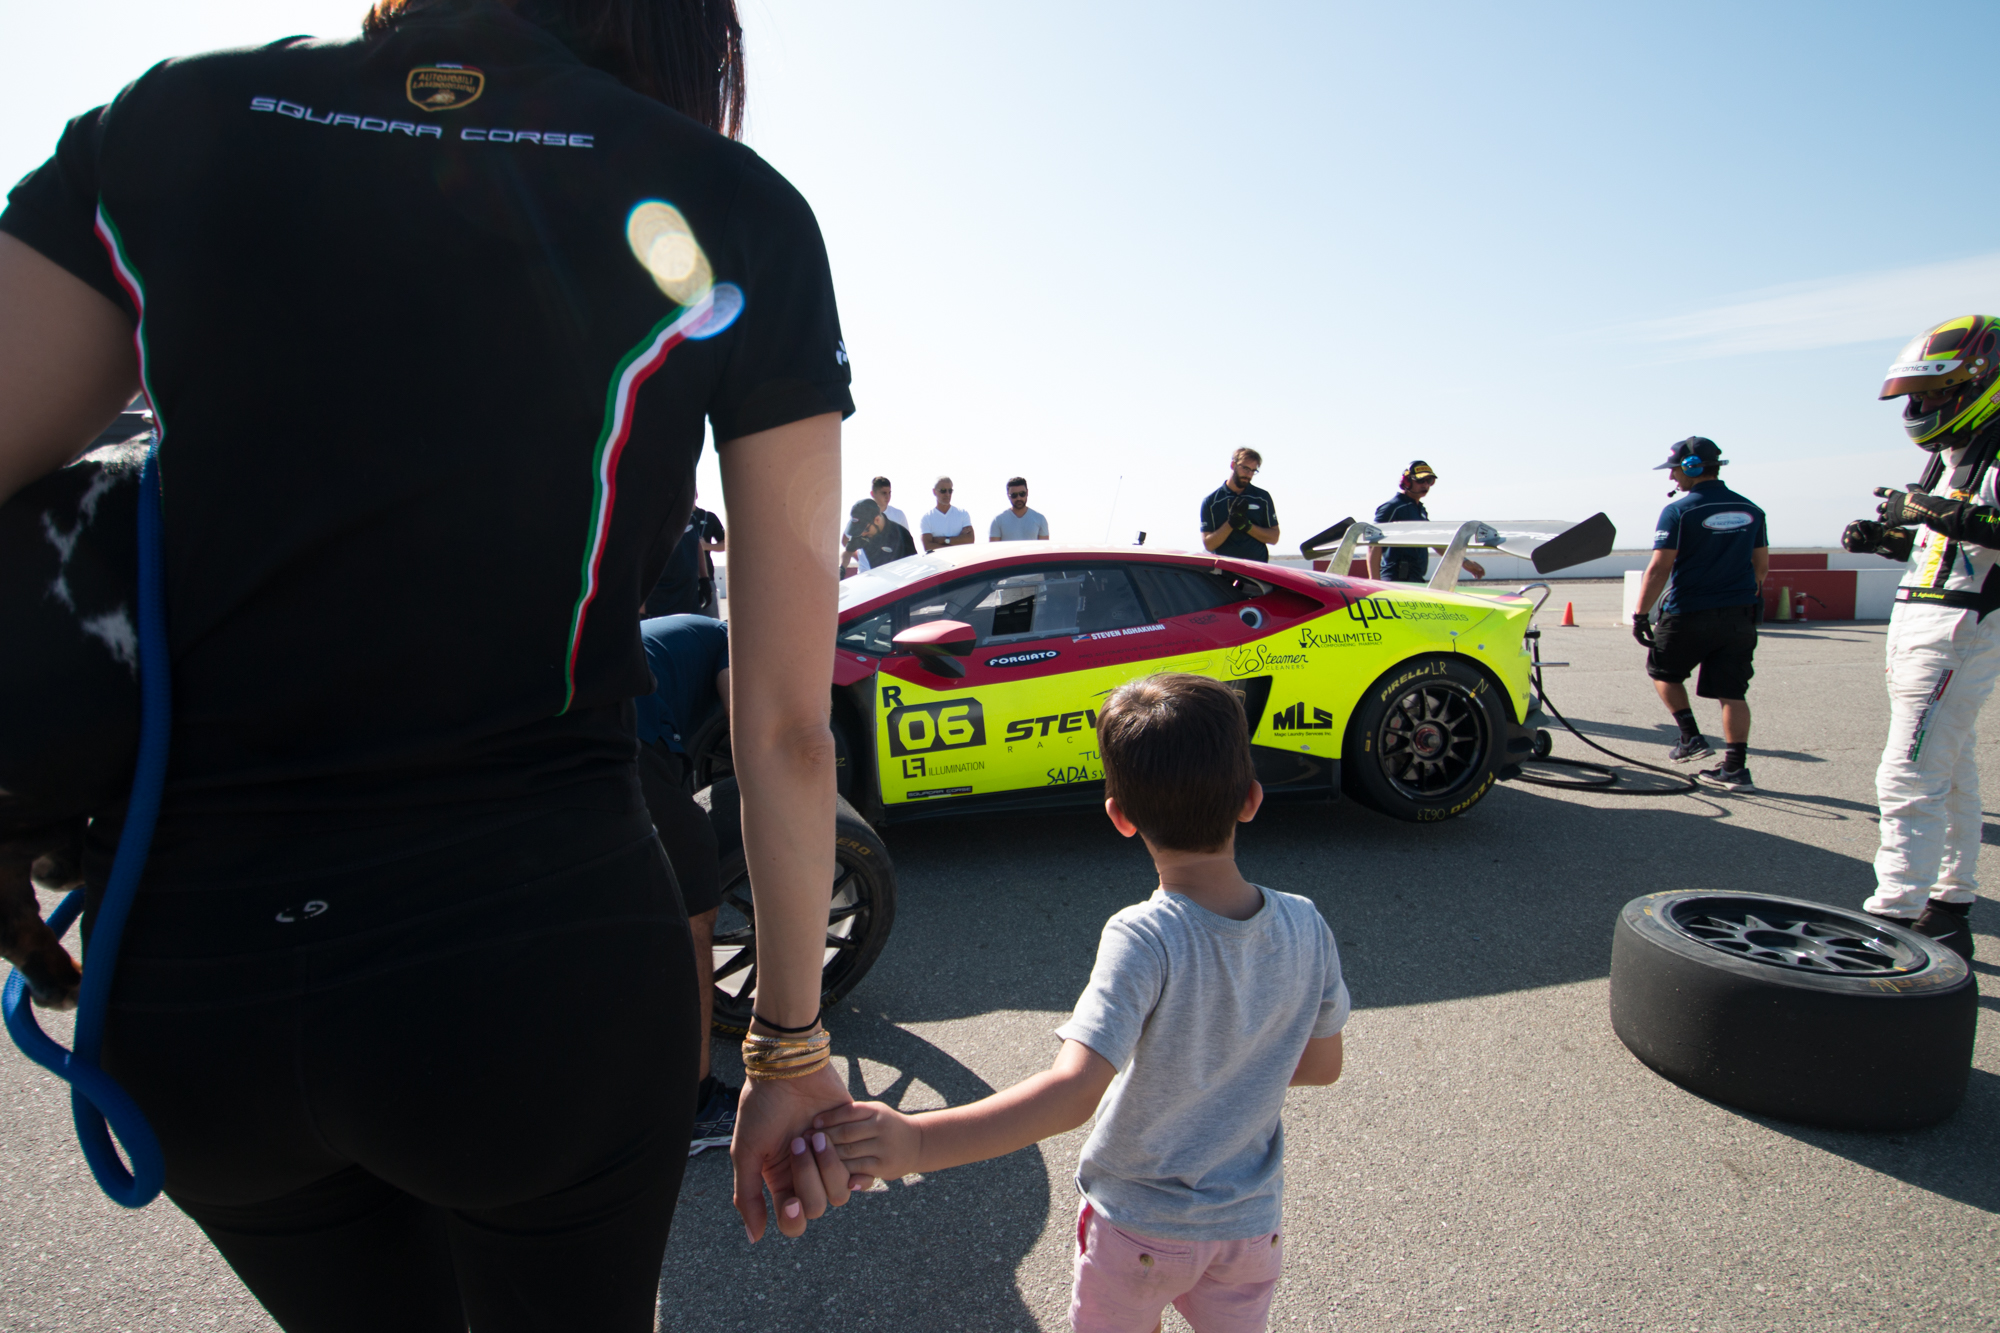 Steven-Racing-20130228-55402.jpg